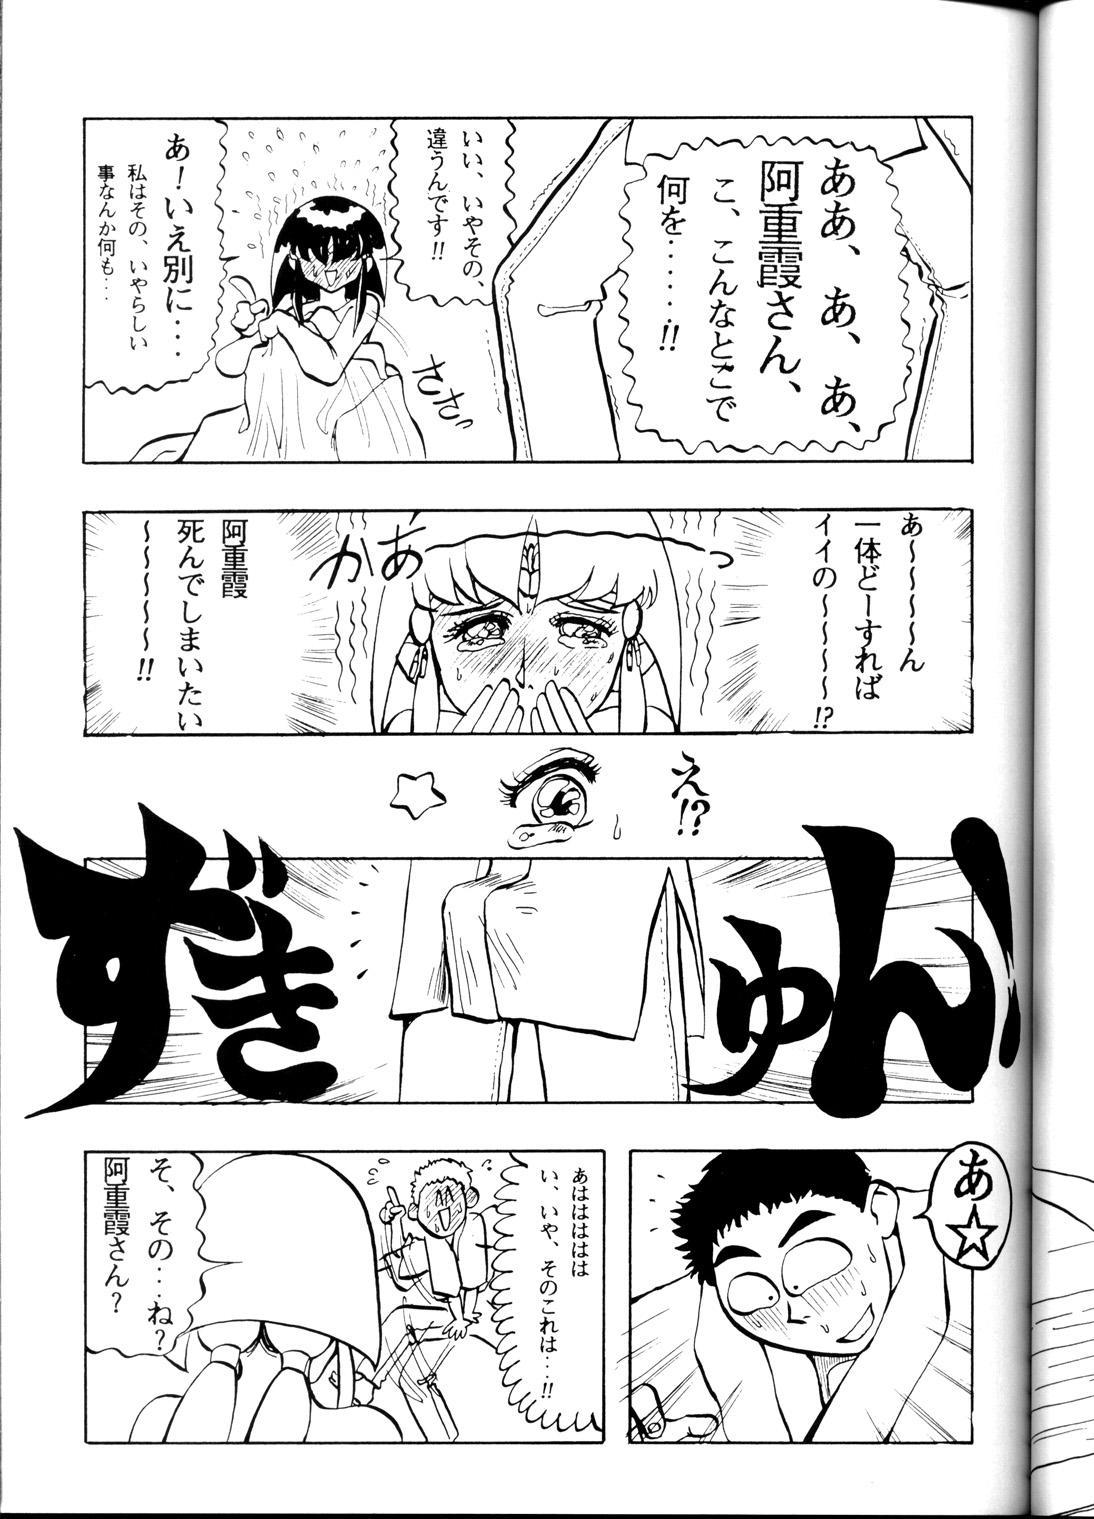 [B.B.C] Tenchi Muyou! Ryou-ou-ki Kaiteiben (Tenchi Muyou!) 41